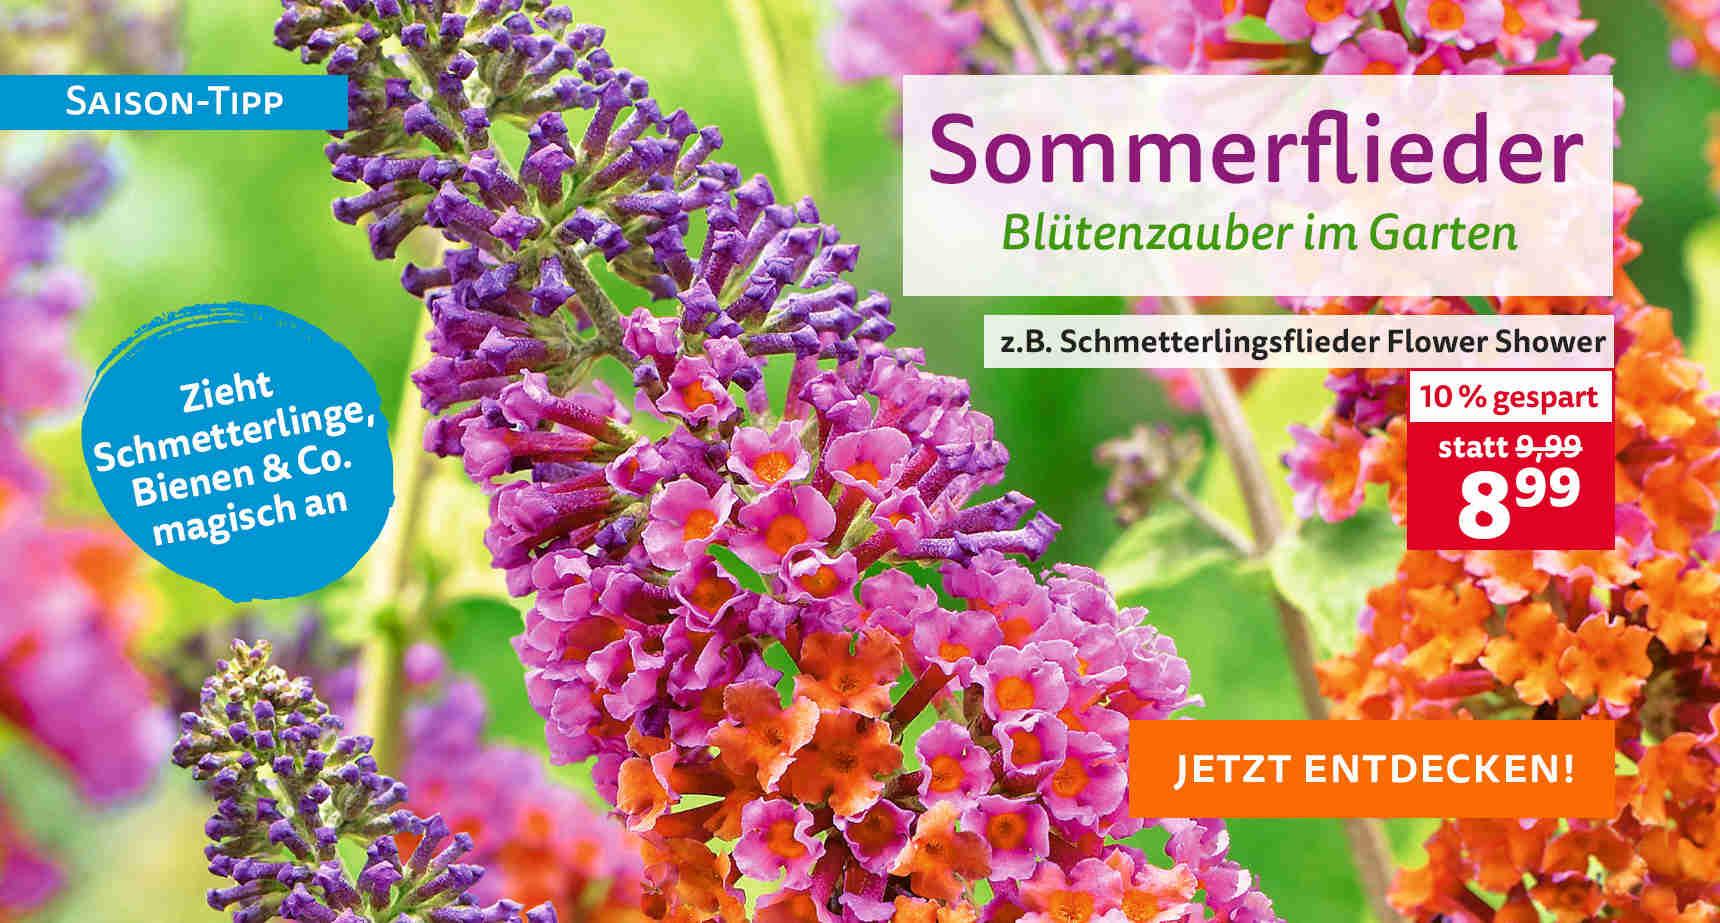 +++ (2) Sommerflieder +++ - 3